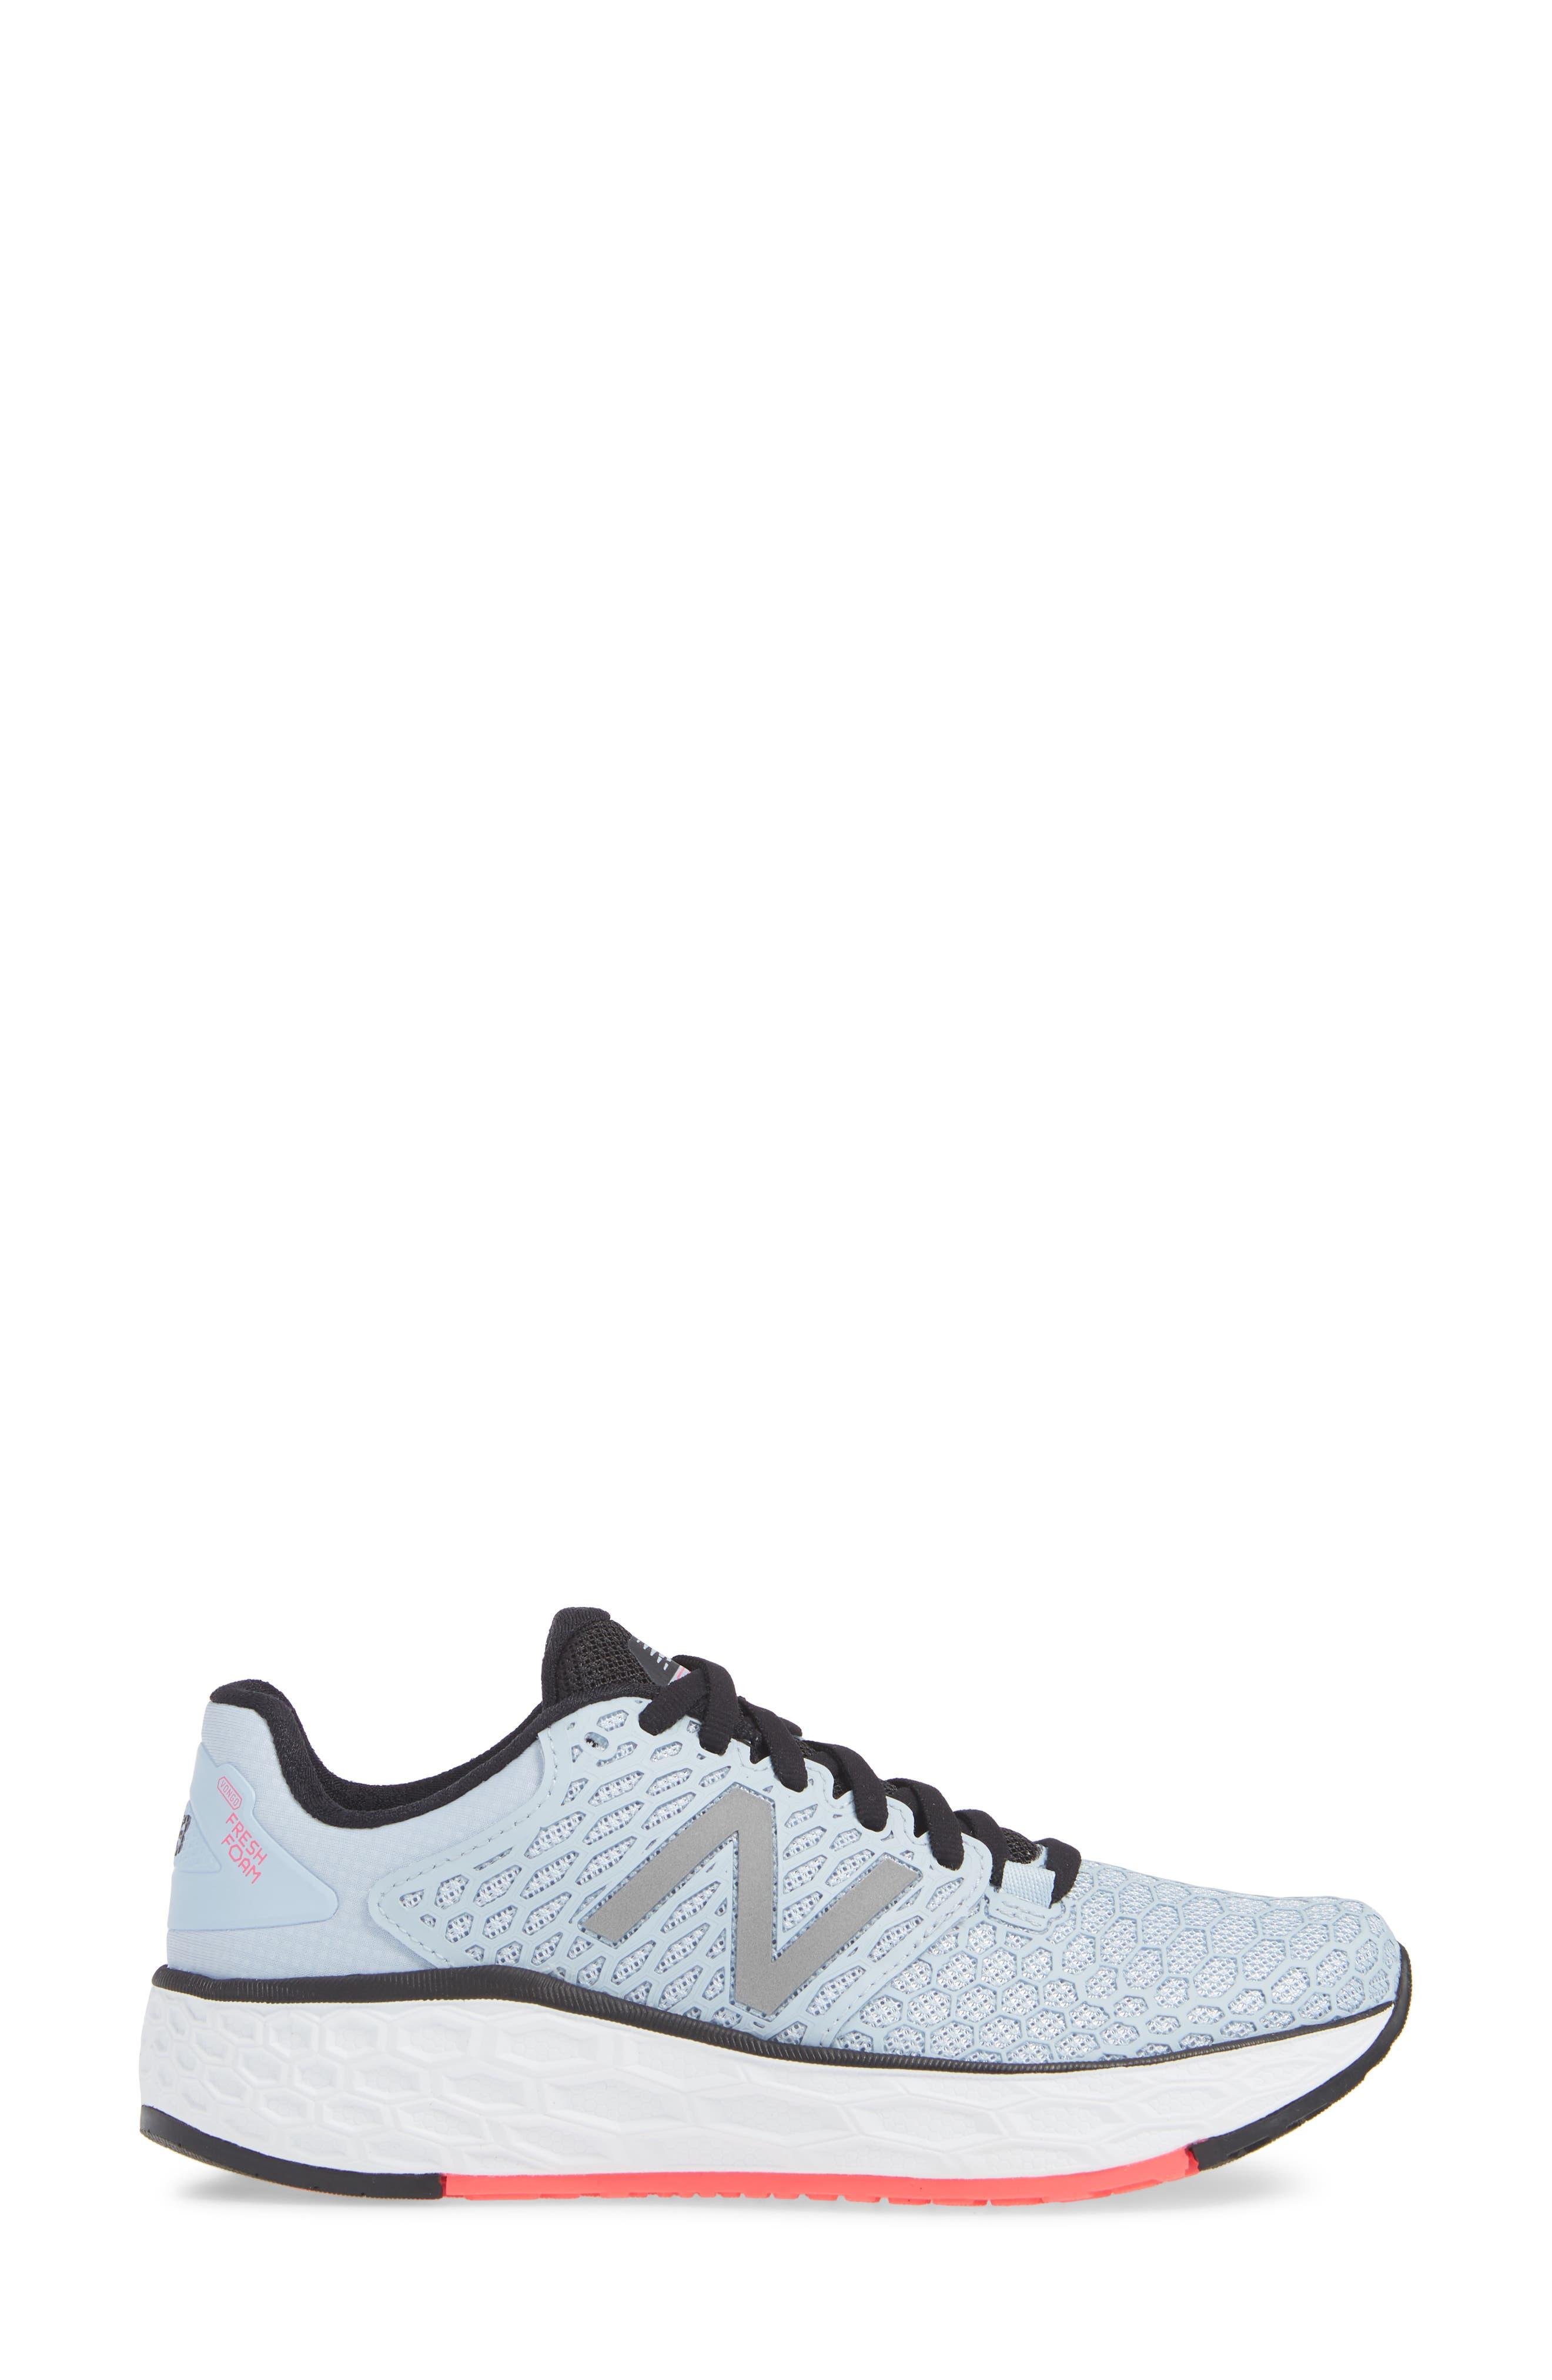 Fresh Foam Vongo Running Shoe,                             Alternate thumbnail 3, color,                             ICE BLUE